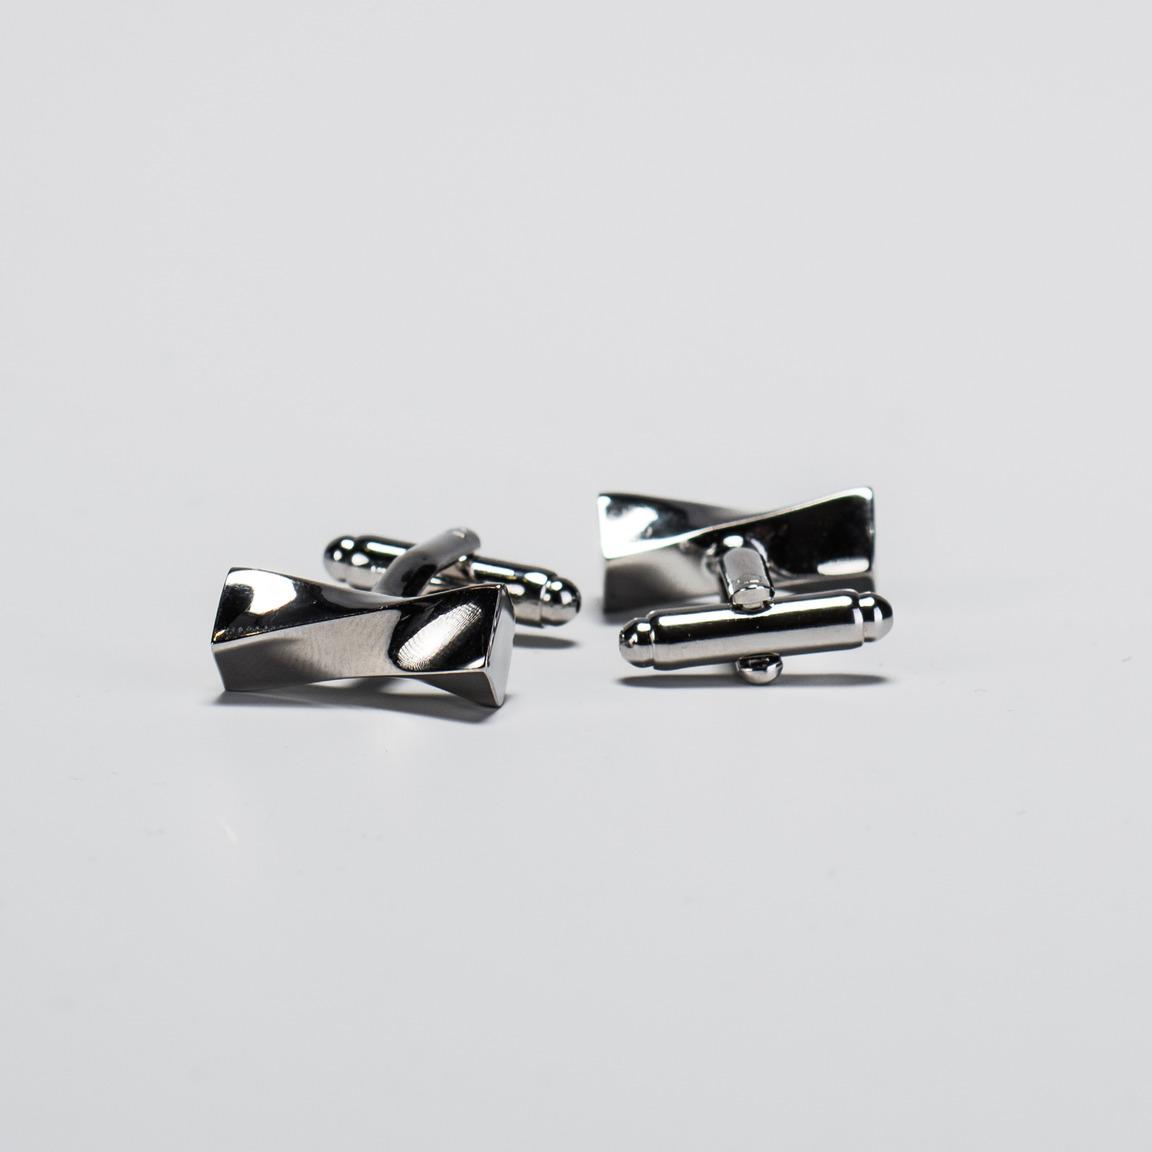 Silver Twist Cufflinks